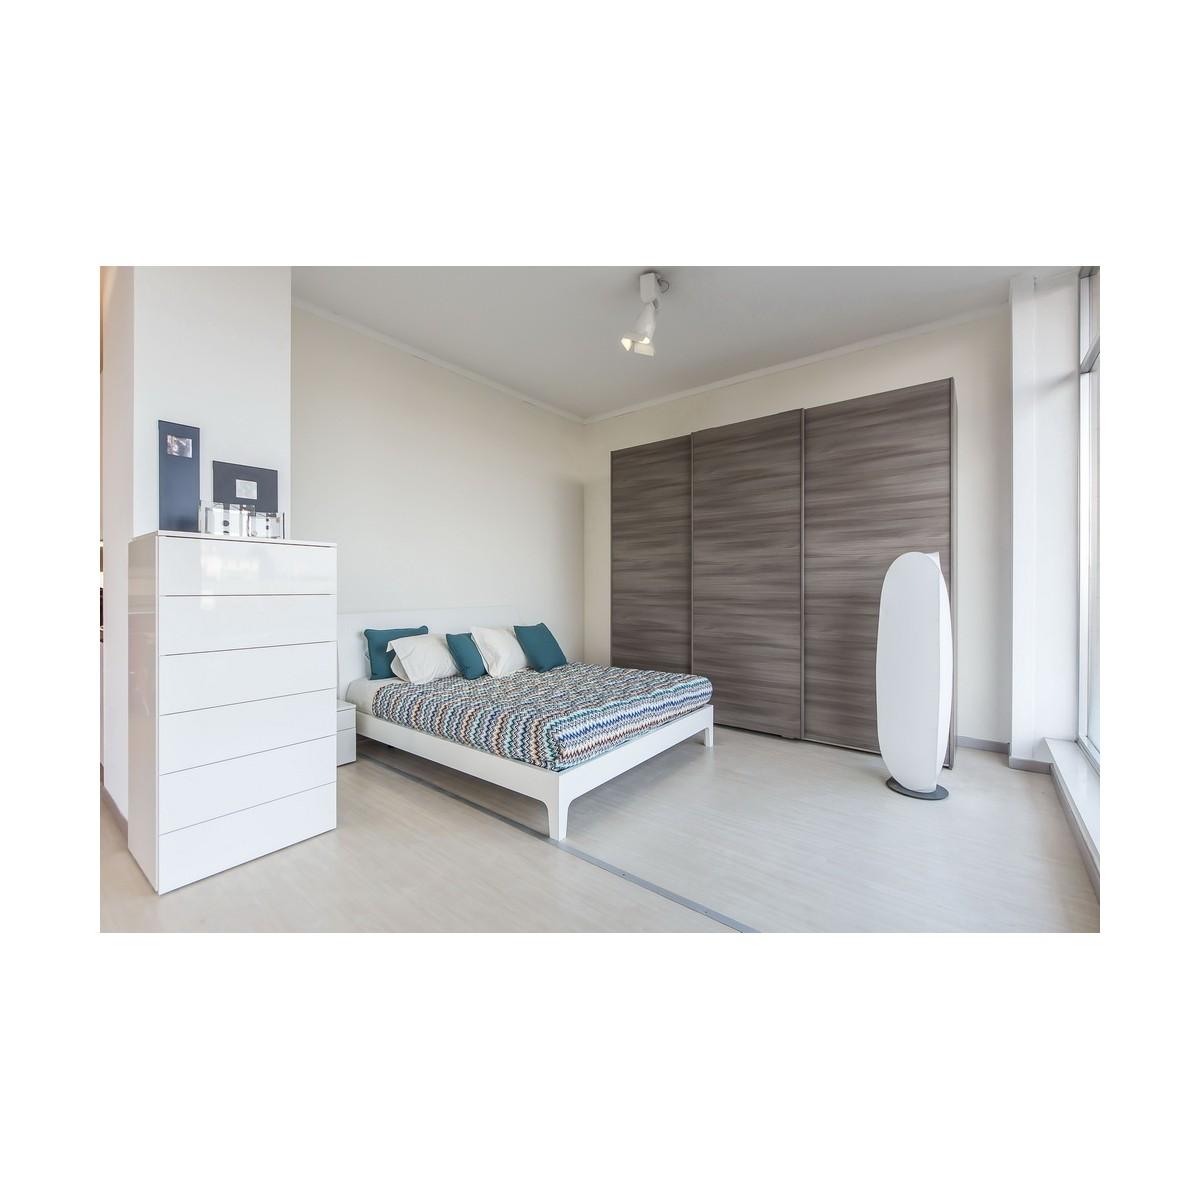 Arredamento completo appartamento verytalian for Arredamento completo